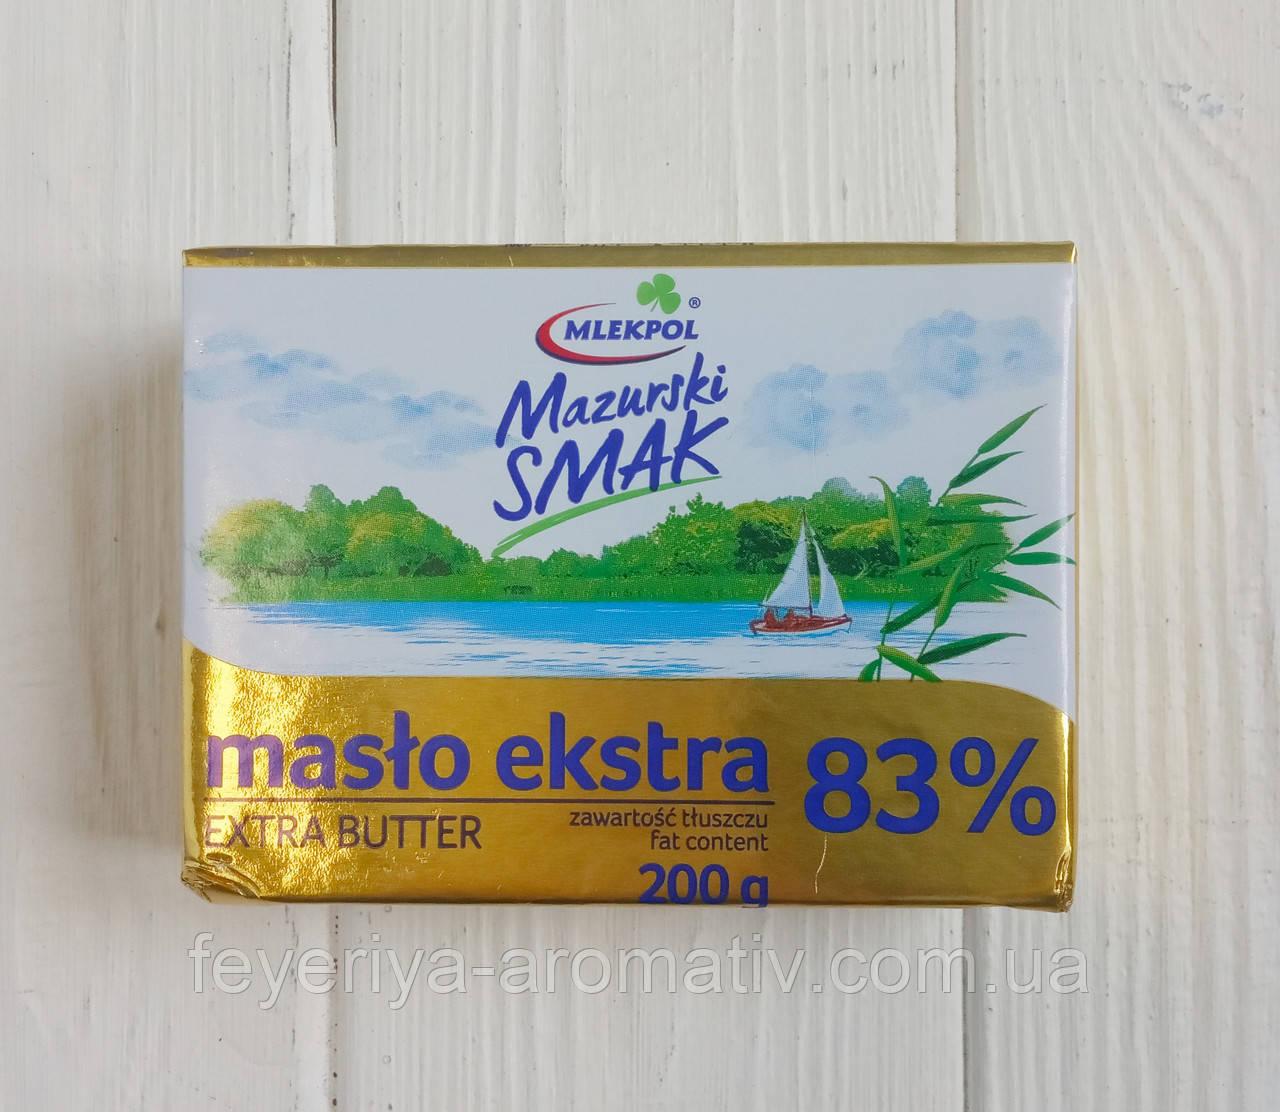 Сливочное масло Mlekpol Mazurski SMAK 83% 200гр (Польша)